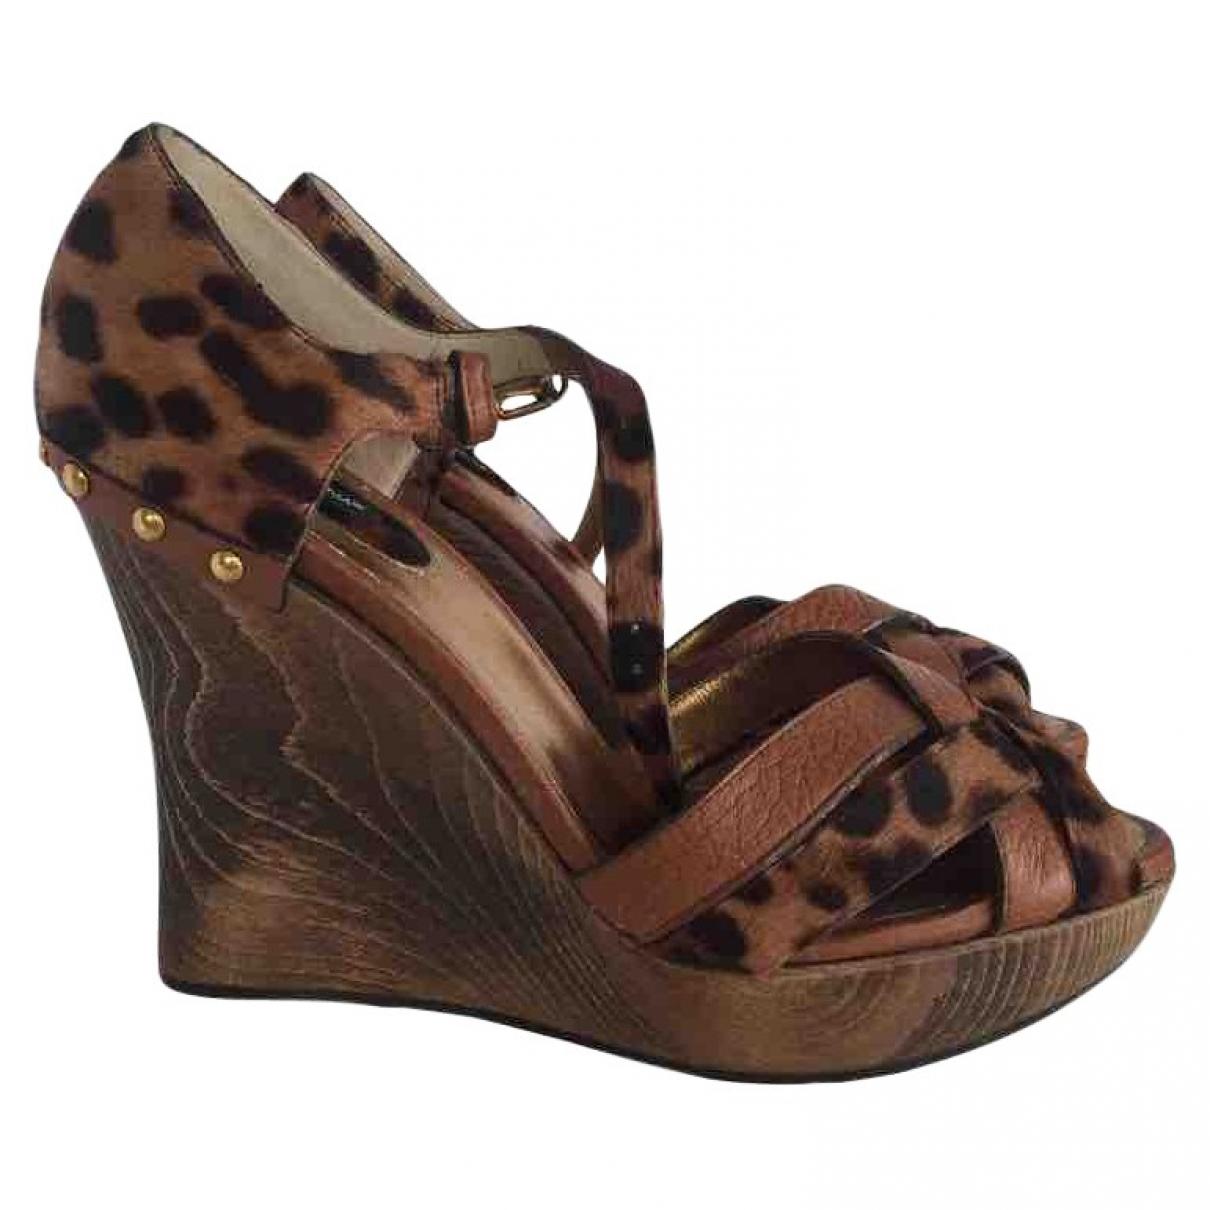 Sandalias de Piel de potro de imitacion Dolce & Gabbana